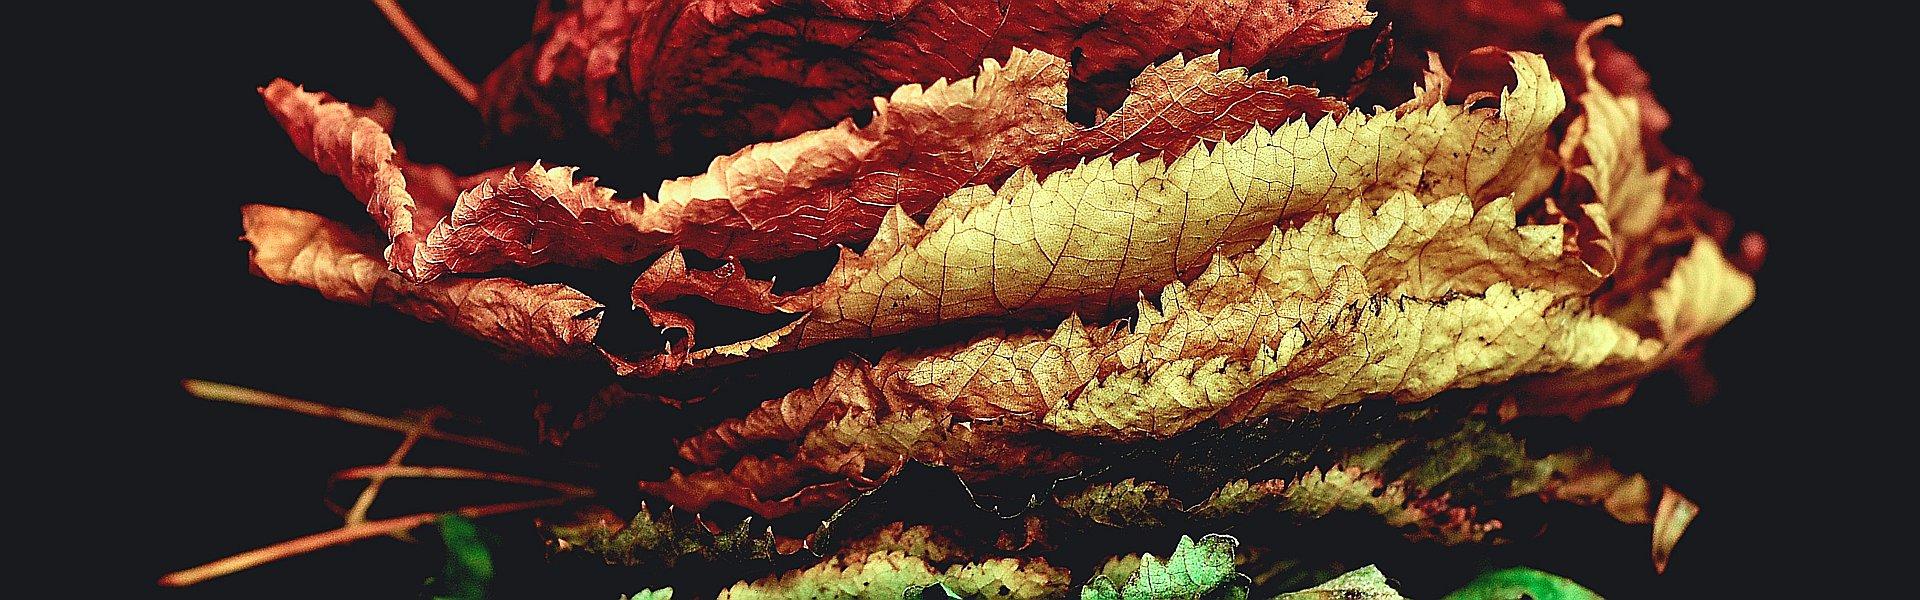 Stapeltje gekleurde herfstbladerenStapeltje gekleurde herfstbladeren